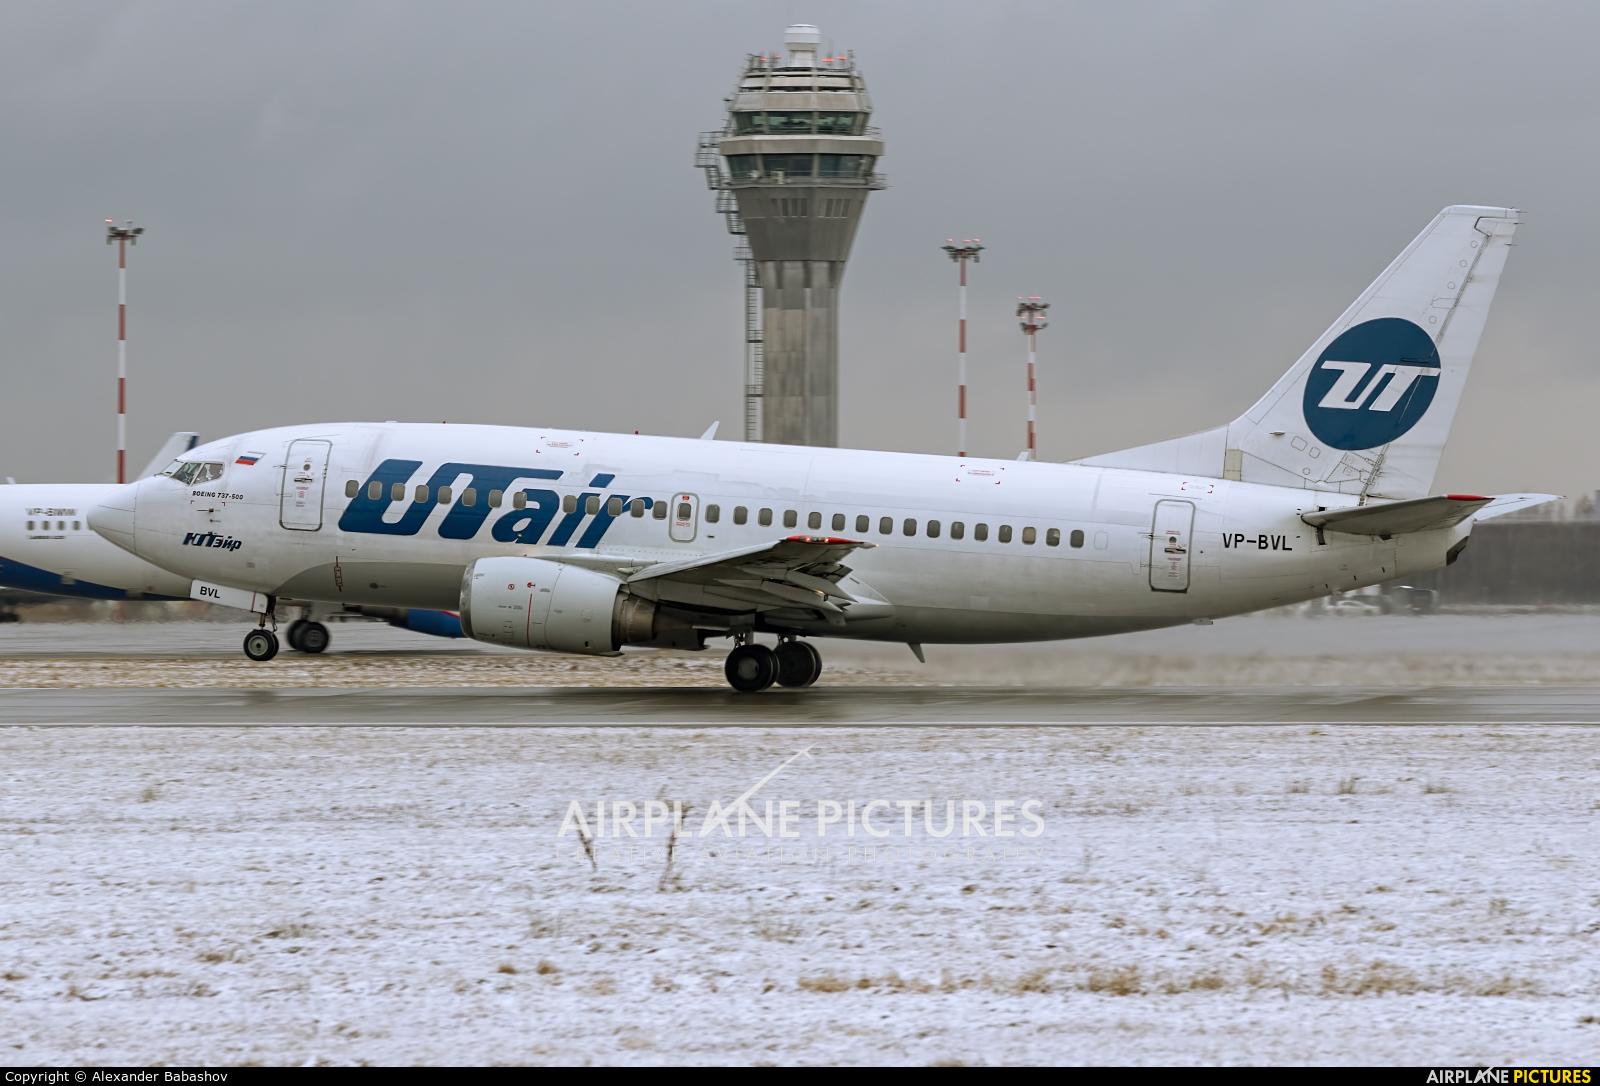 UTair Boeing 737-500 VP-BVL